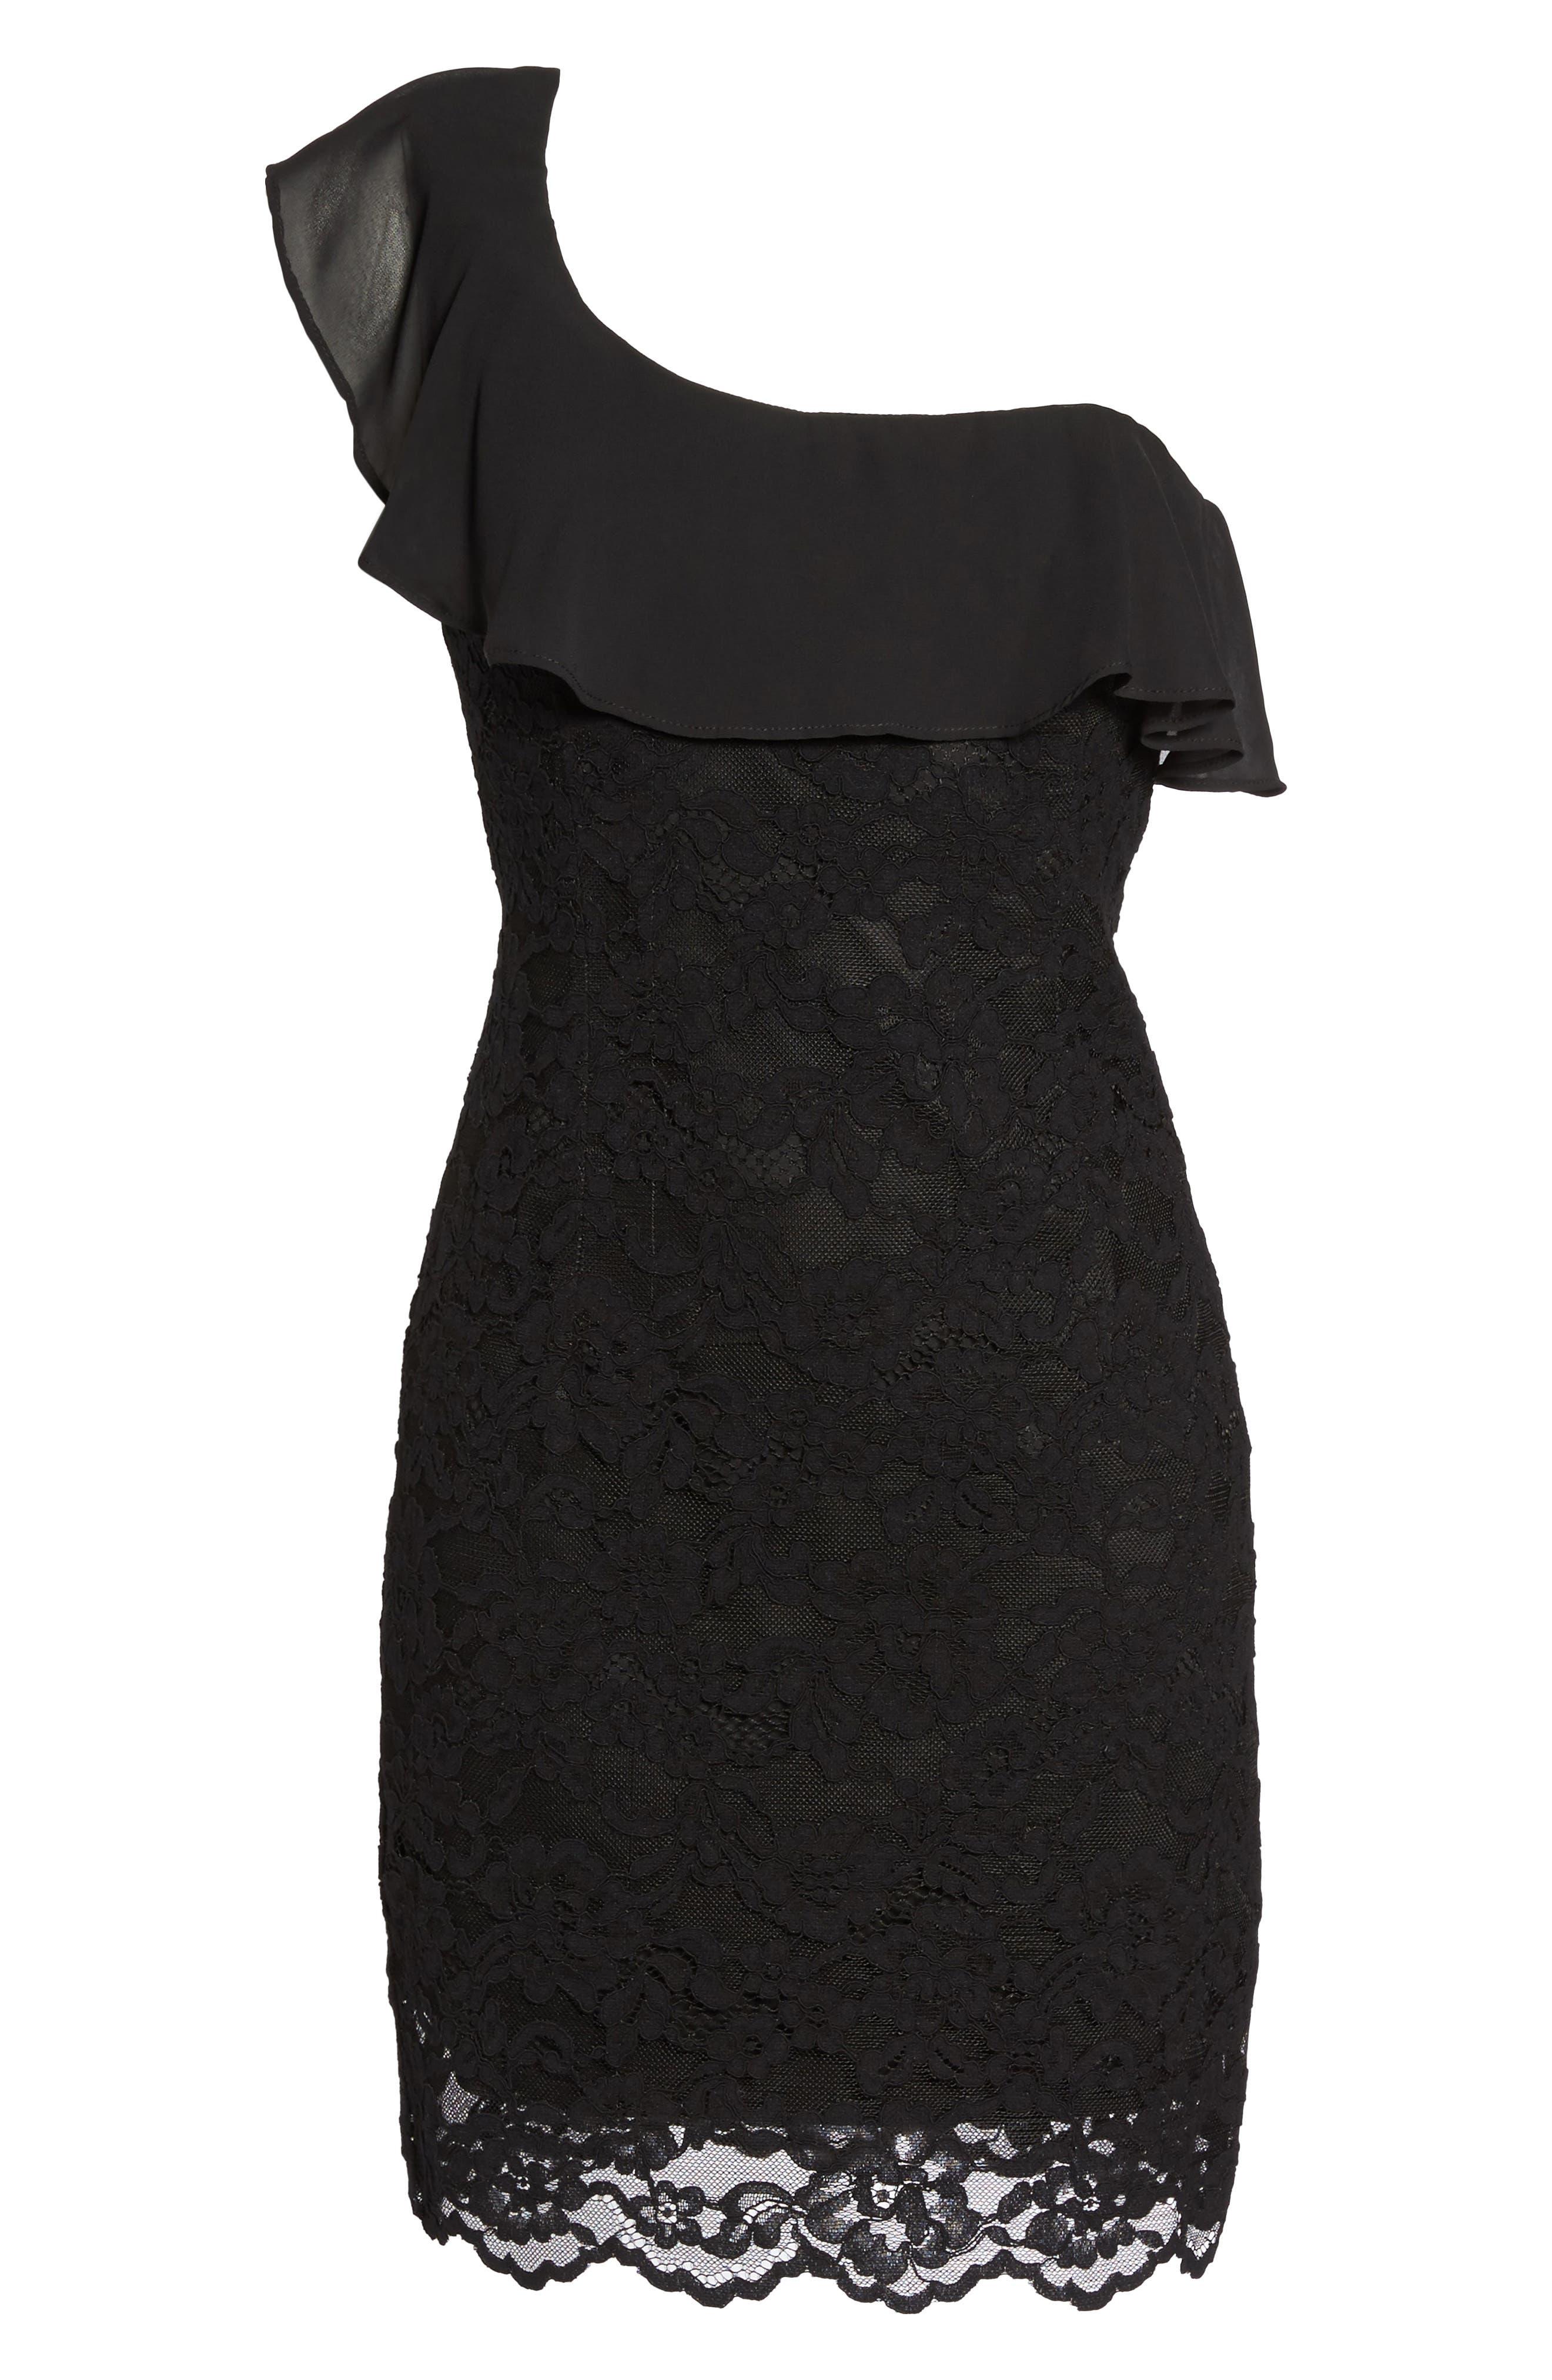 Fiorella One-Shoulder Lace Body-Con Dress,                             Alternate thumbnail 6, color,                             Black